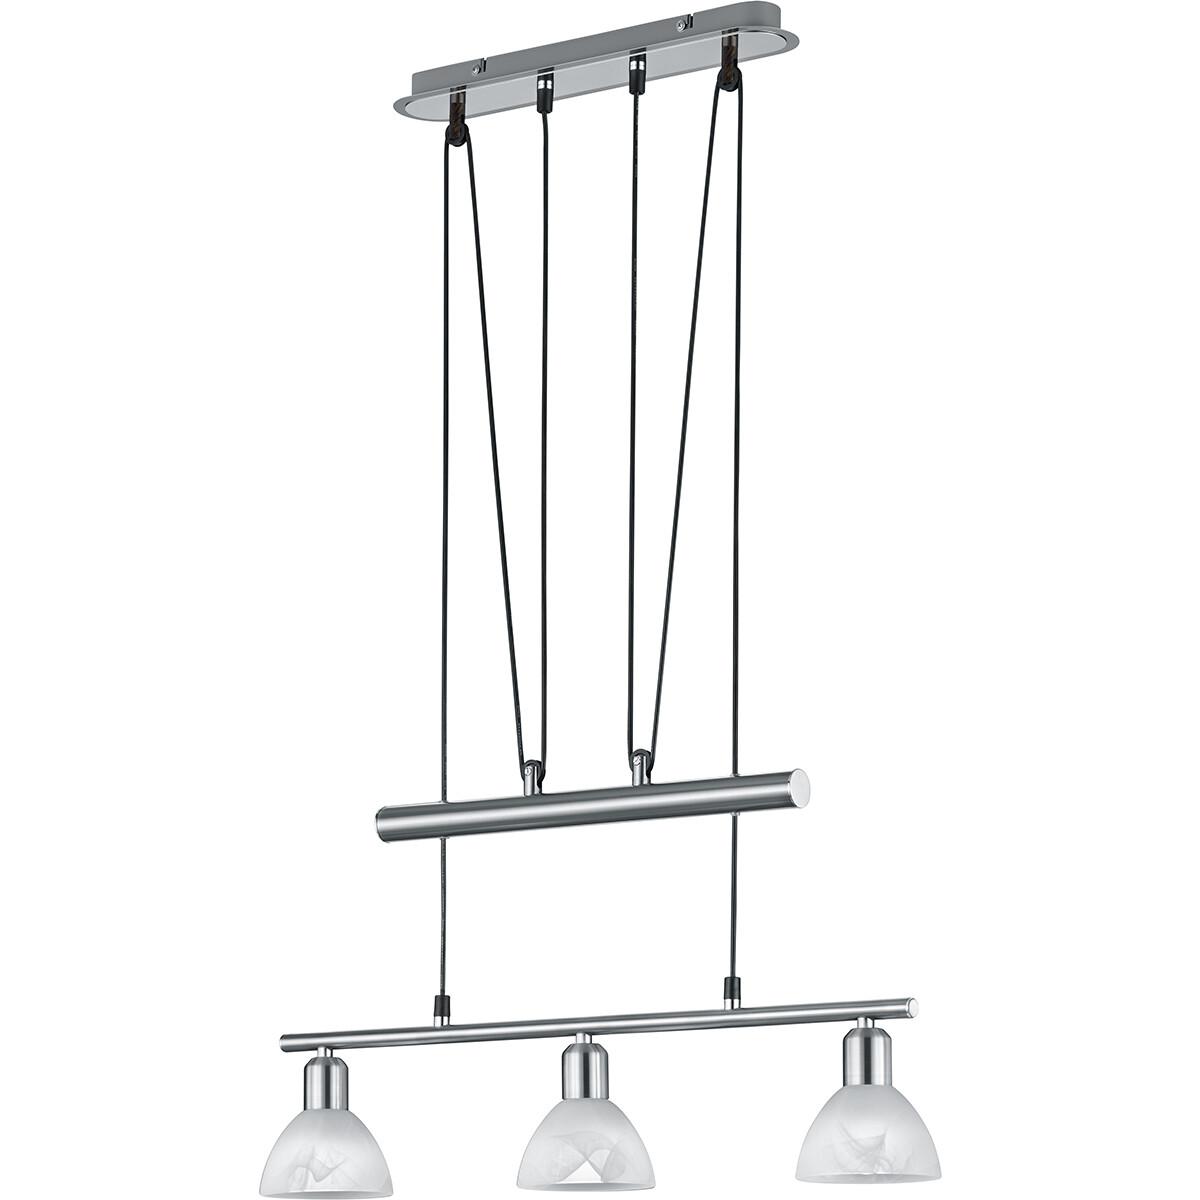 LED Hanglamp - Hangverlichting - Trion Levino - E14 Fitting - Warm Wit 3000K - 3-lichts - Rechthoek